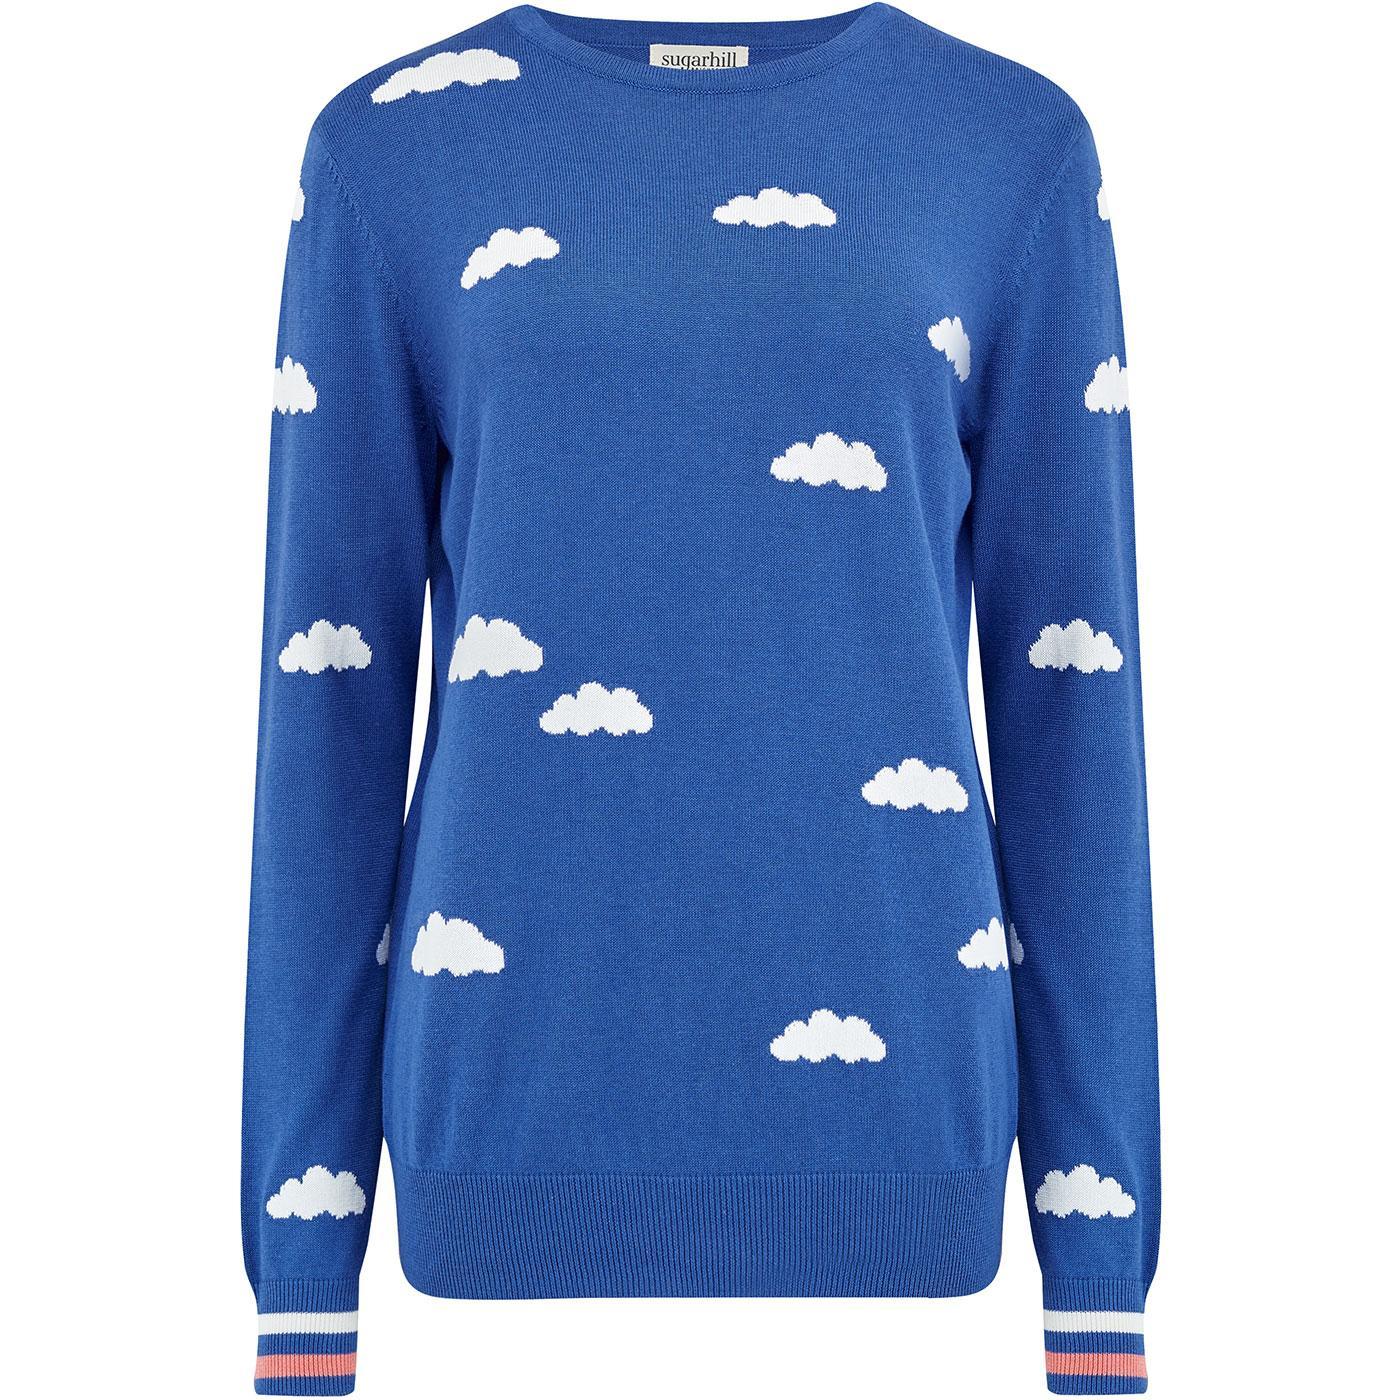 K0151 rita summer skies sweater blue